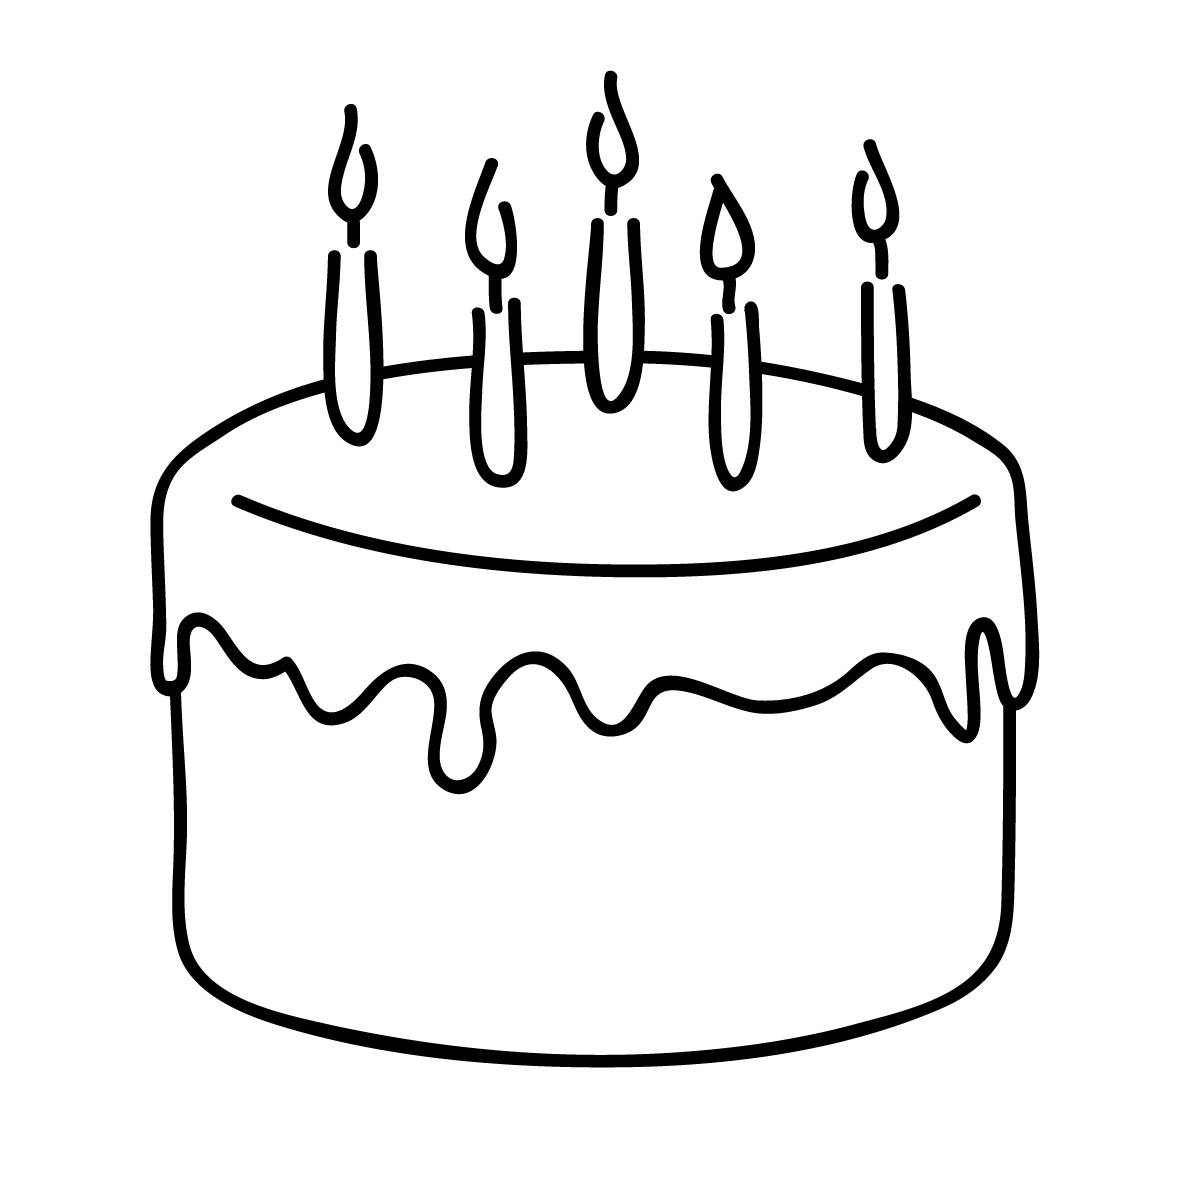 Cake Clip Art Free Clipart Panda